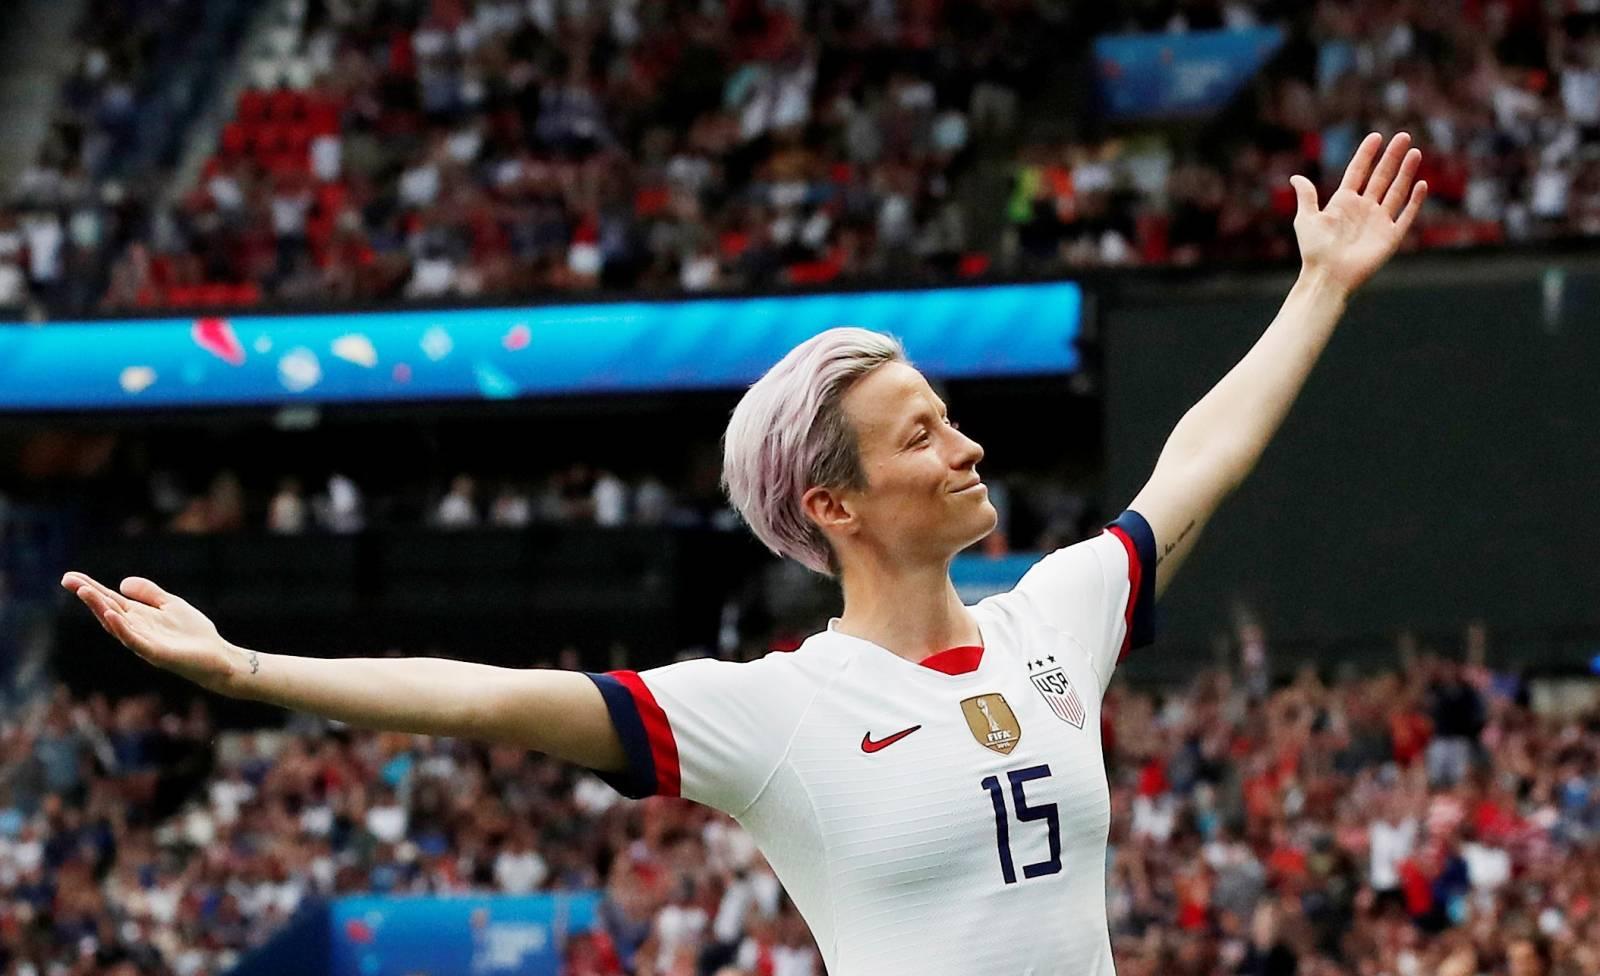 Women's World Cup - Quarter Final - France v United States